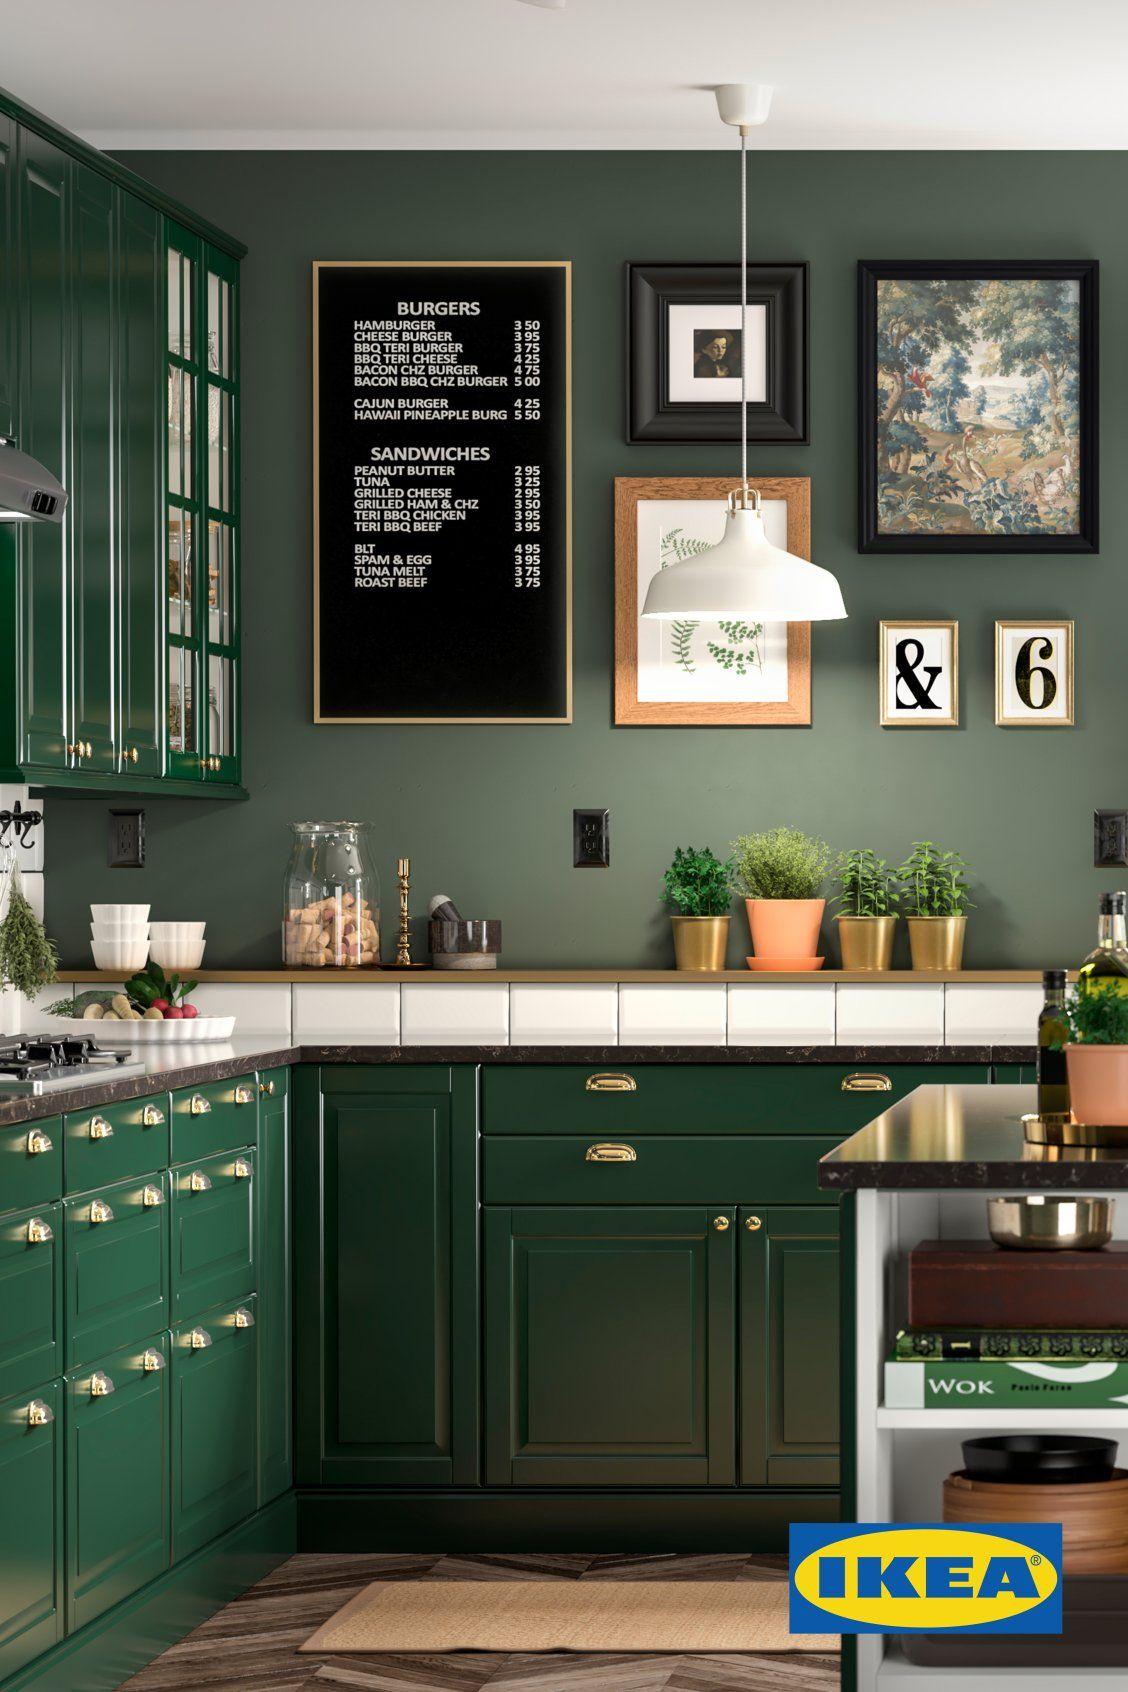 Kitchen Ideas And Inspiration Green Kitchen Cabinets Dark Green Kitchen Kitchen Interior